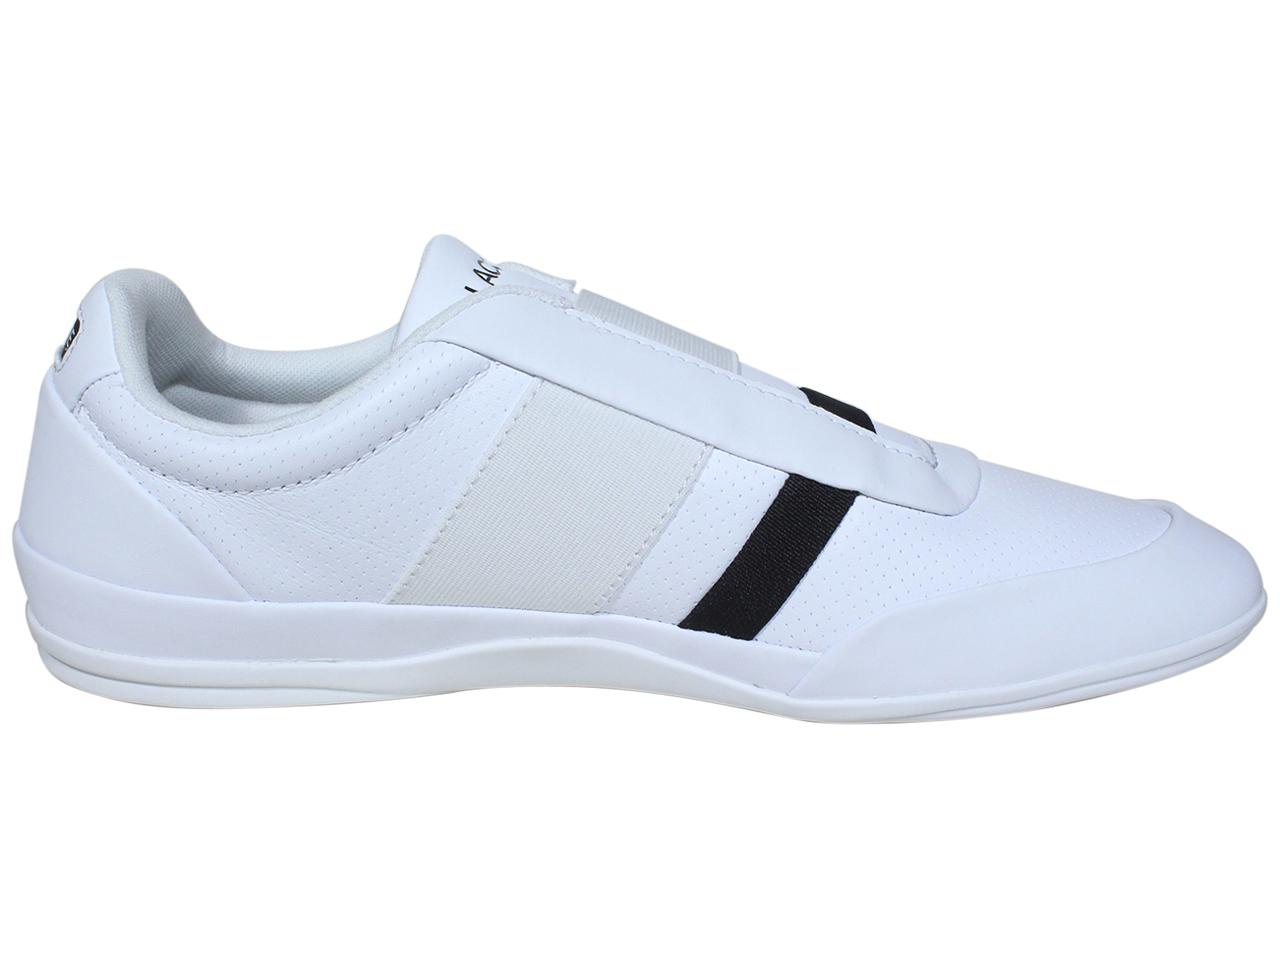 Lacoste-Misano-Elastic-318-Sneakers-Men-039-s-Low-Top-Shoes thumbnail 26